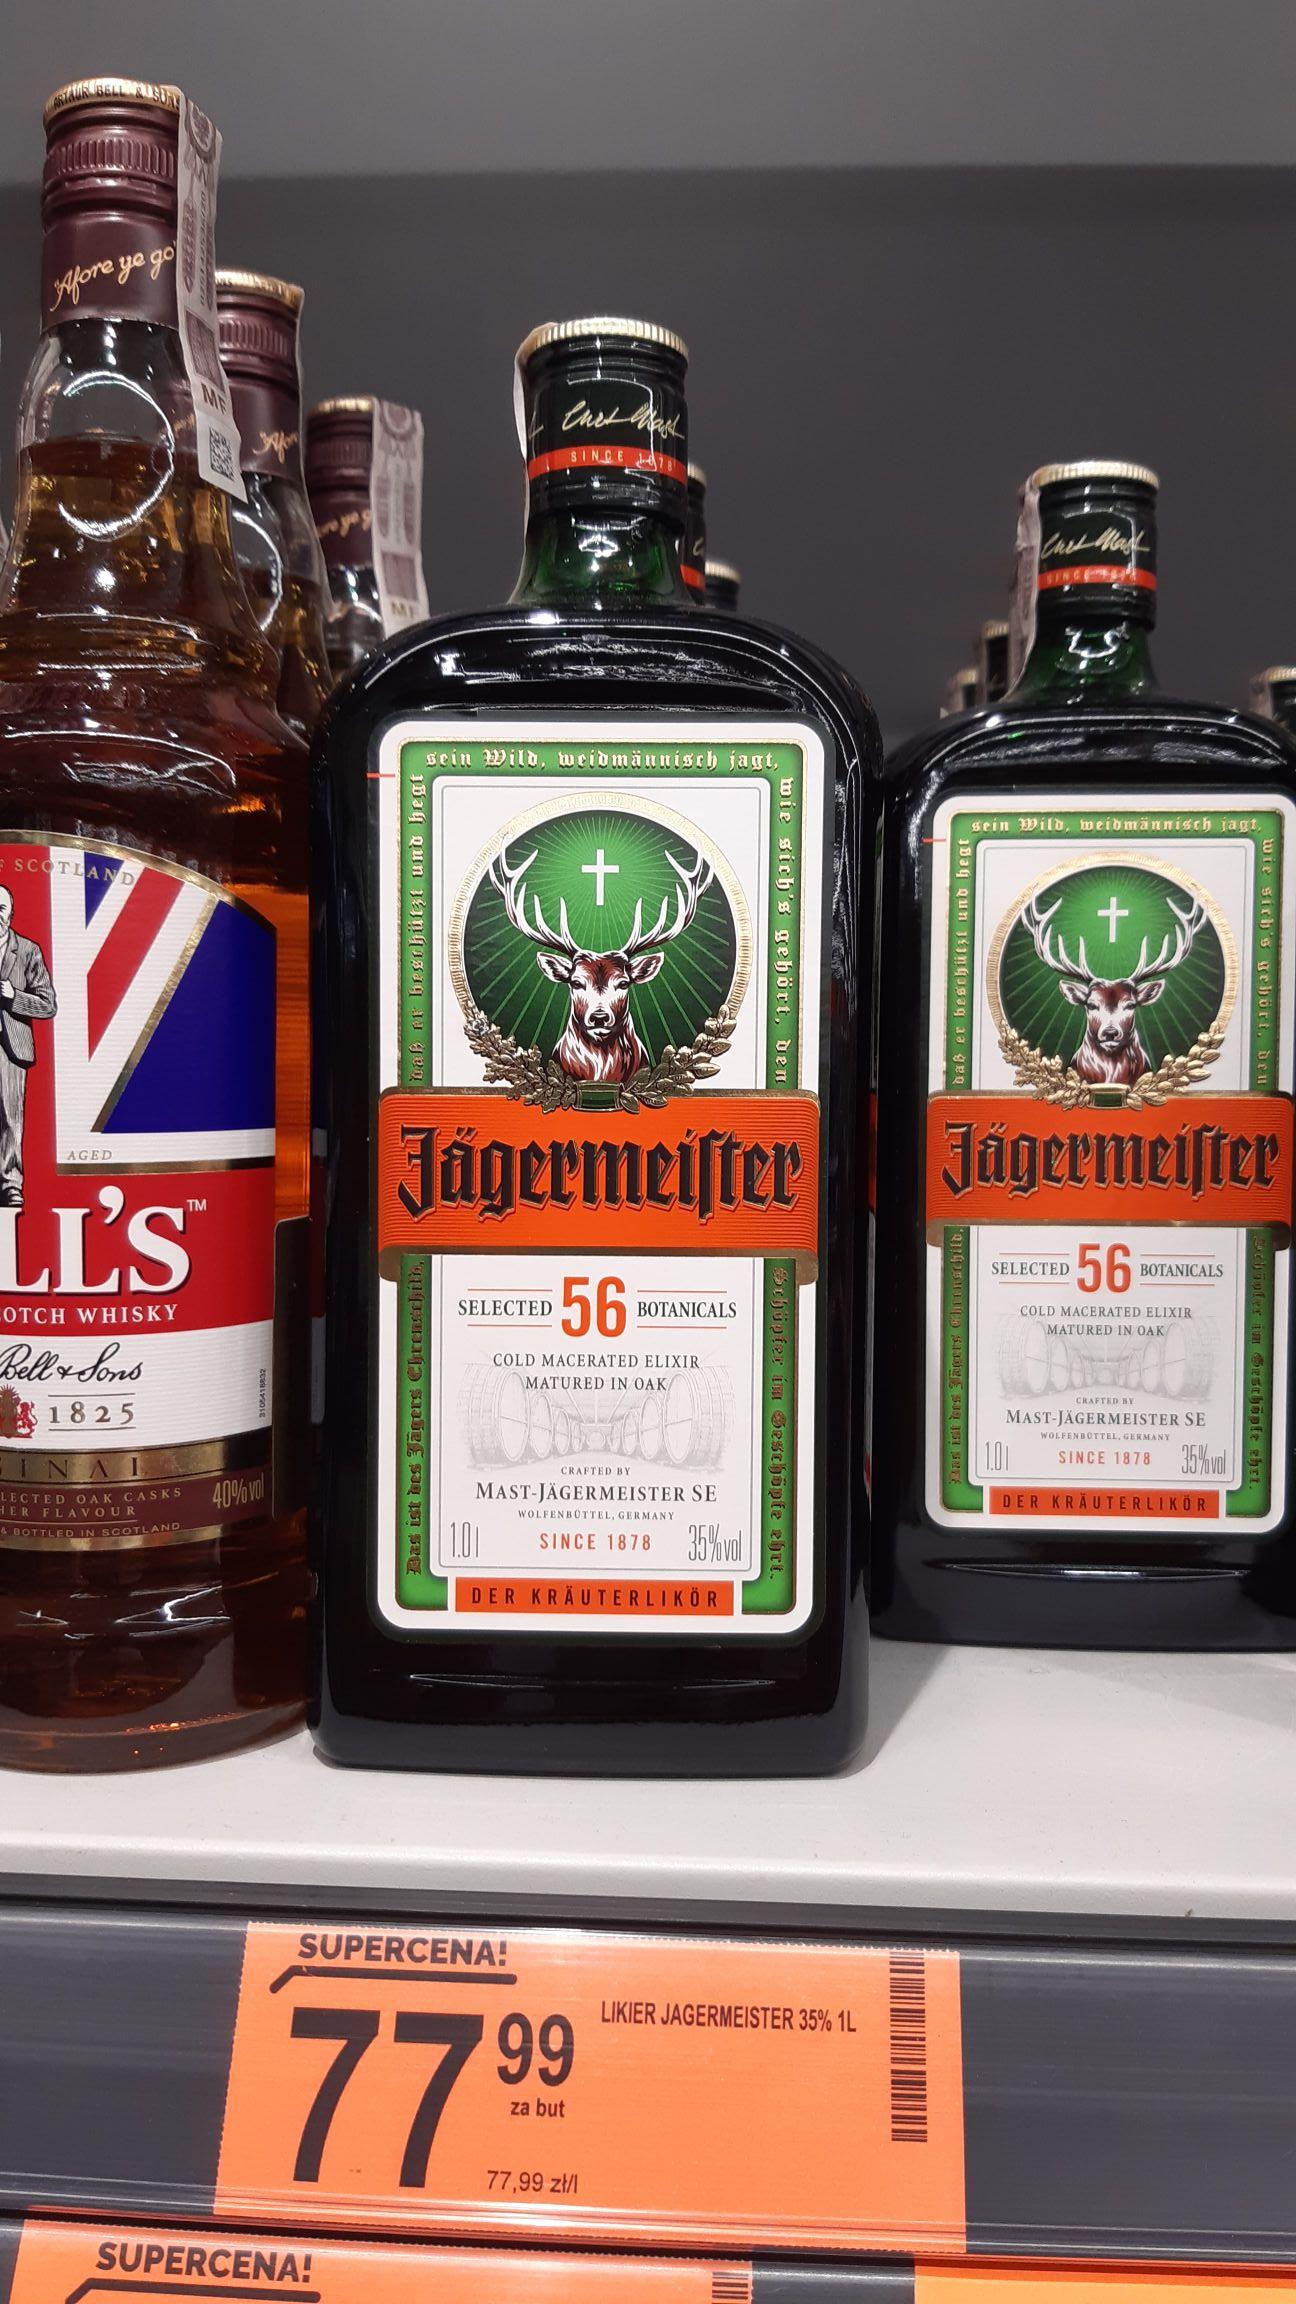 Jägermeister 1 LITR za 77,99 zł.